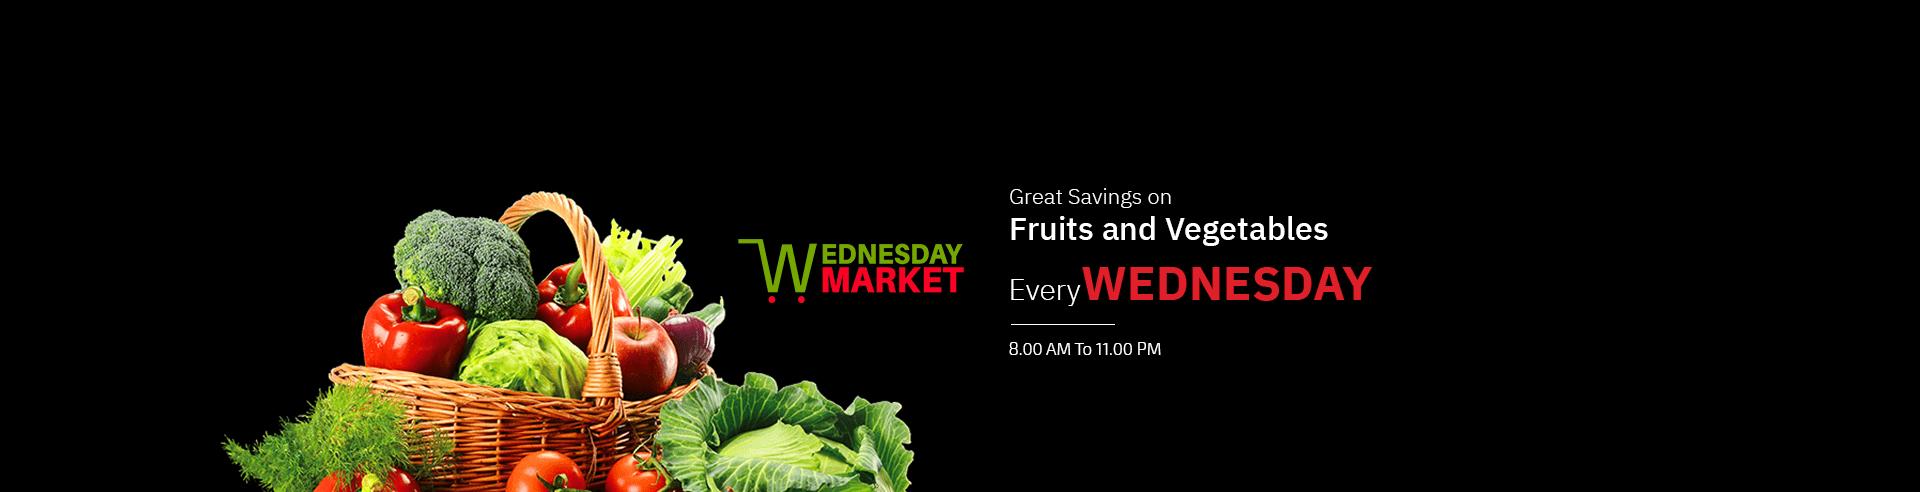 Wednesday Market Offer